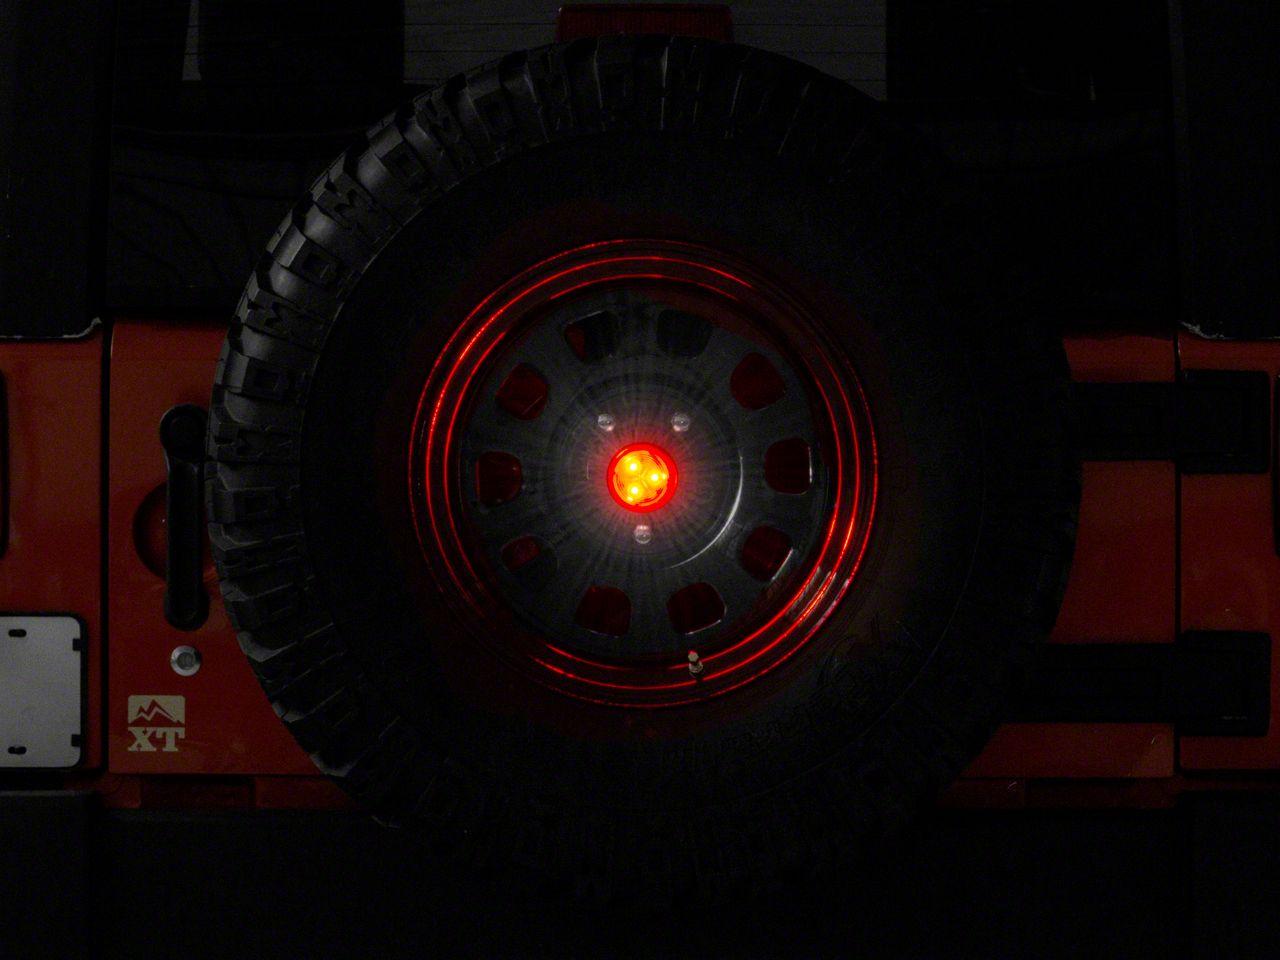 Rock-Slide Engineering Spare Tire Mount Third Brake Light (87-18 Wrangler YJ, TJ & JK)